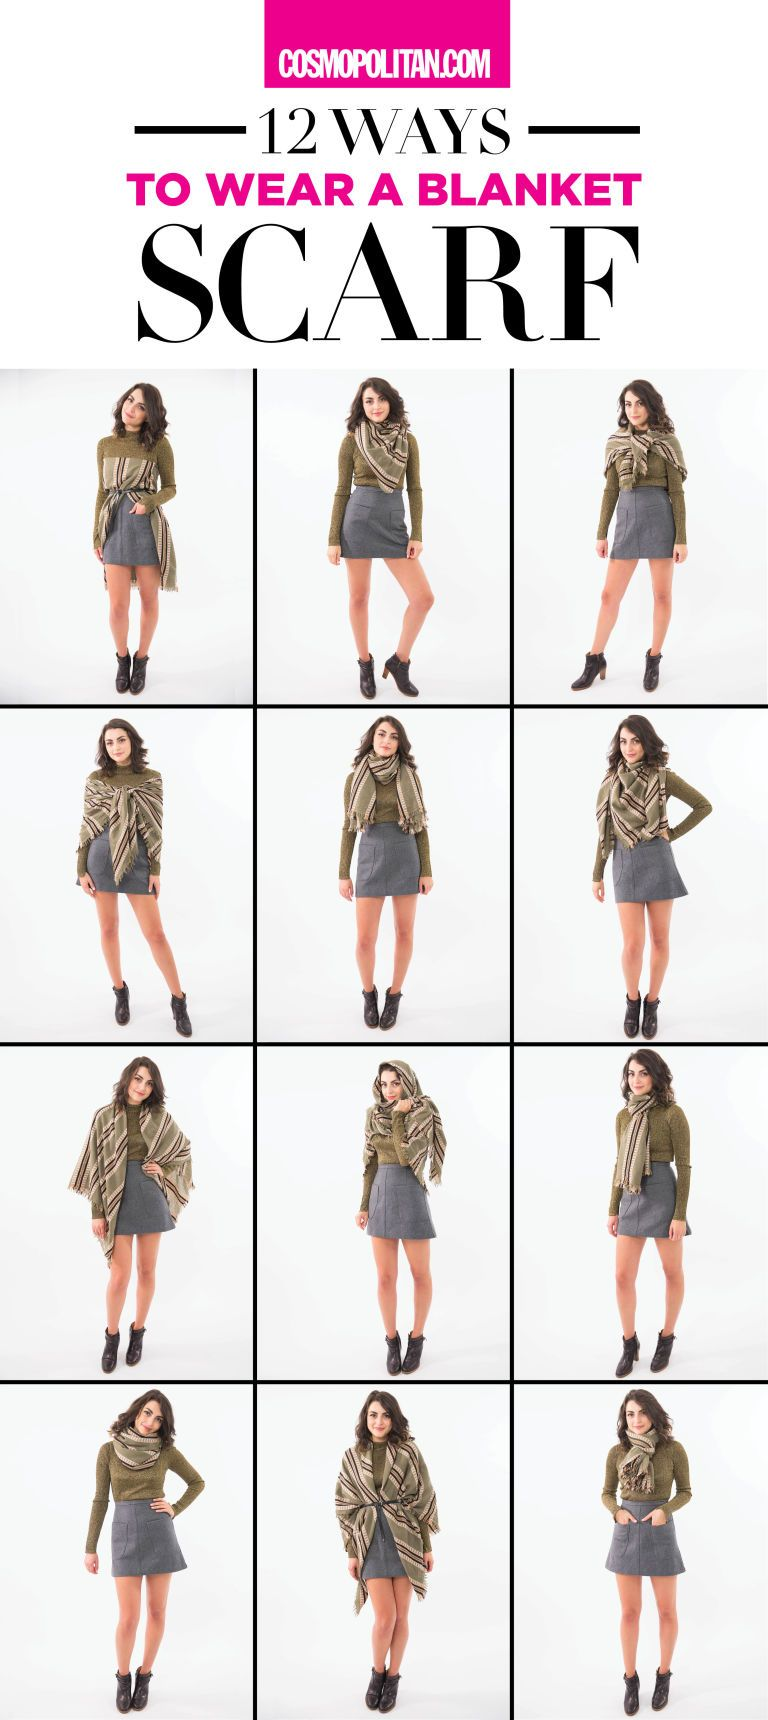 11 Ways to Wear a Blanket Scarf  6d19bc05f